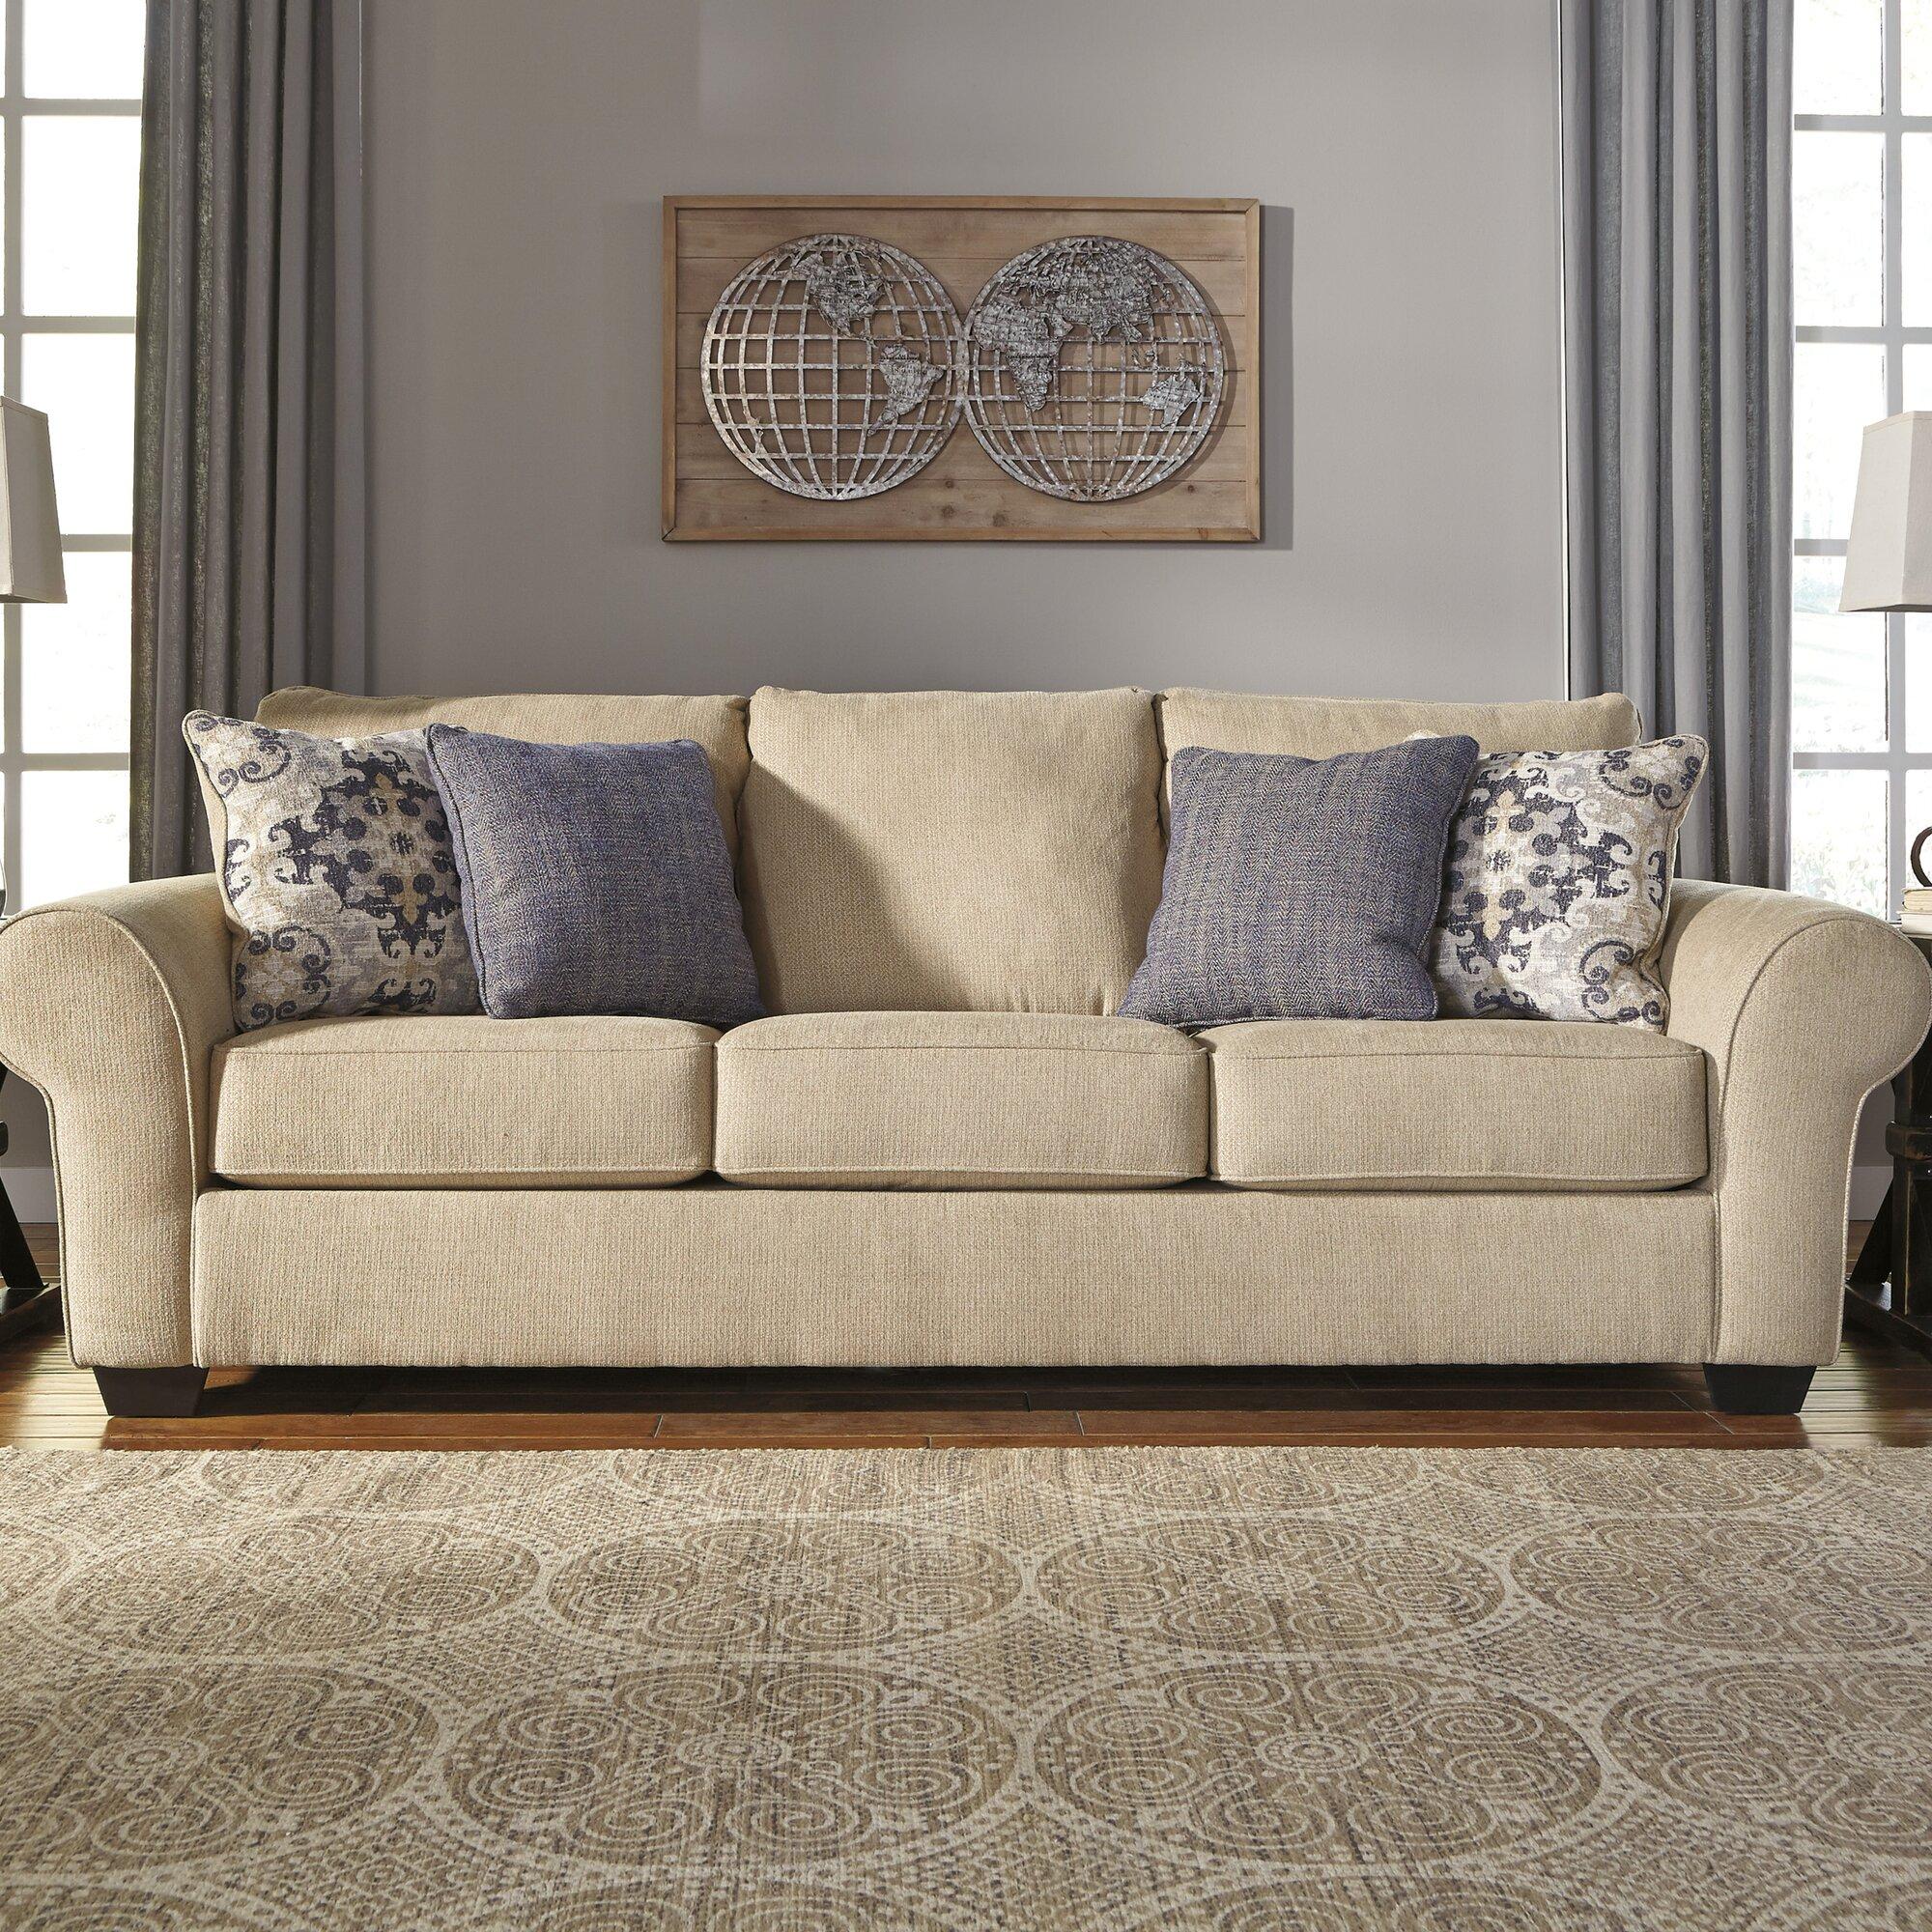 Pier One Alton Sleeper Sofa Reviews Www Stkittsvilla Com